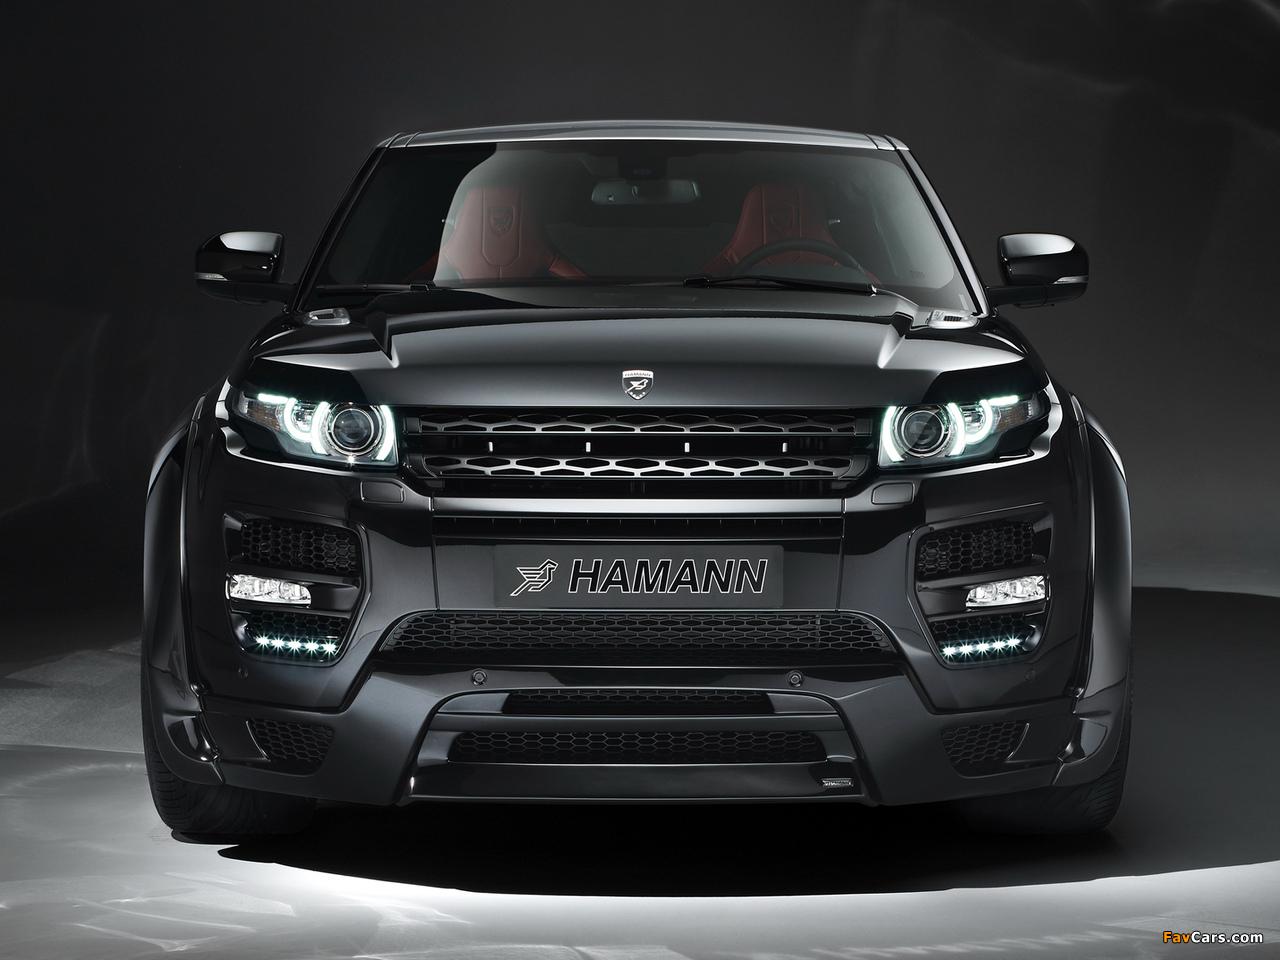 Hamann Range Rover Evoque Coupe 2012 images (1280 x 960)